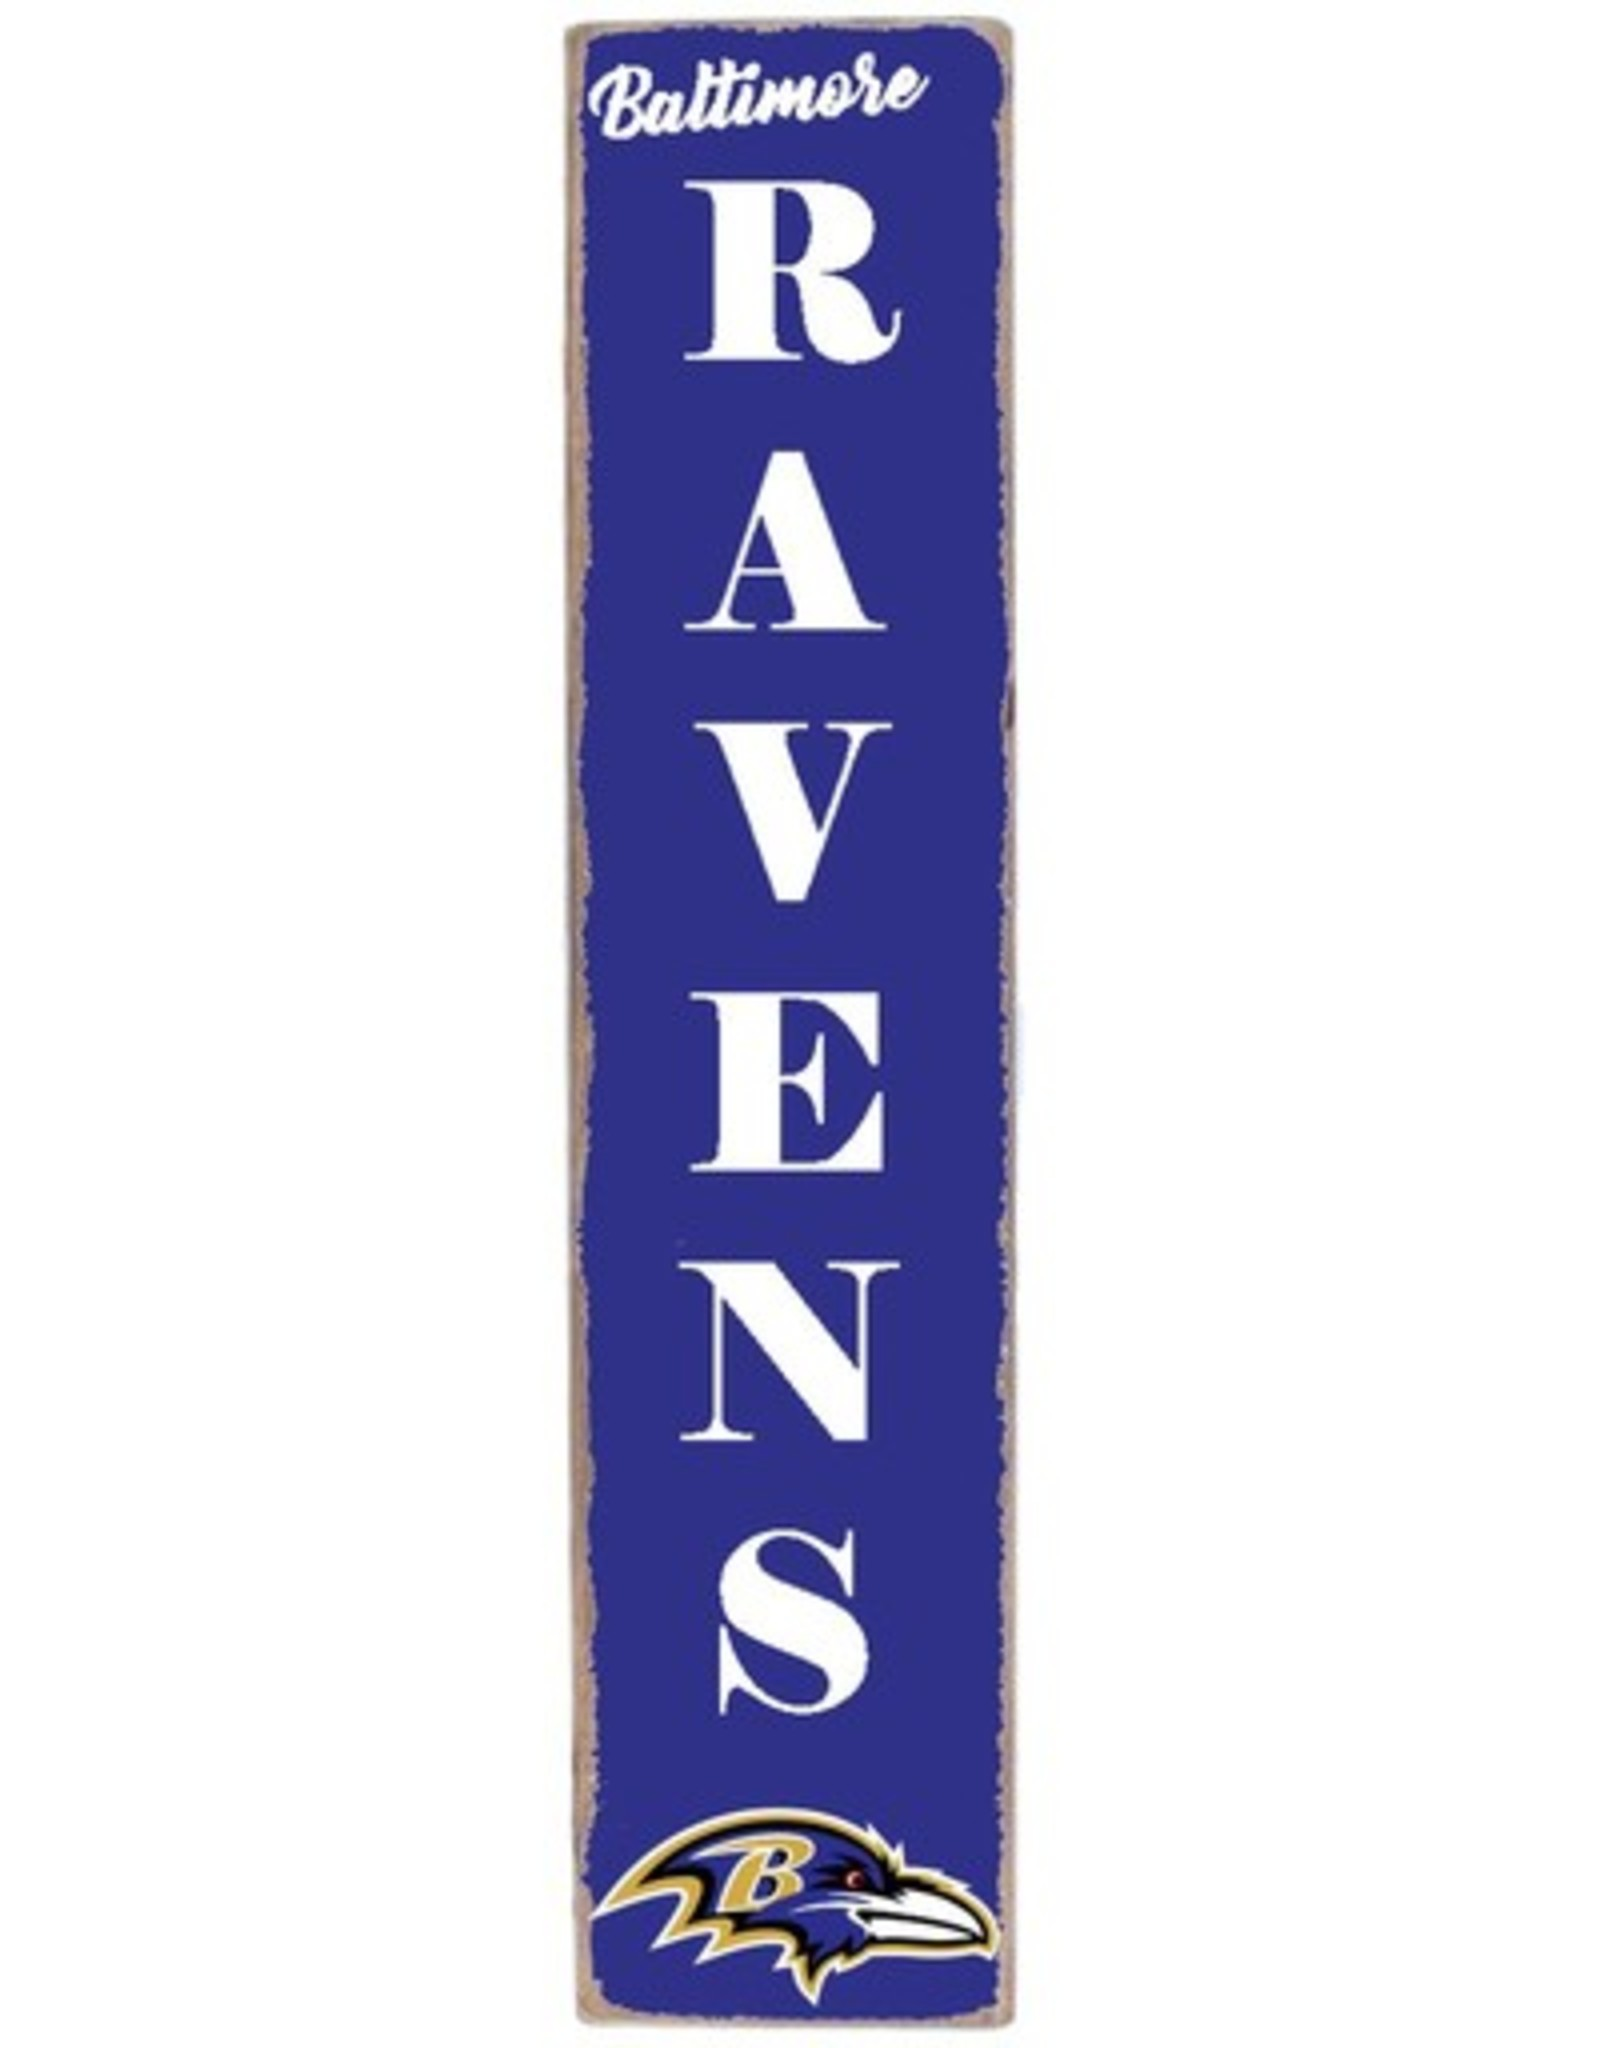 RUSTIC MARLIN Baltimore Ravens Vertical Rustic Sign